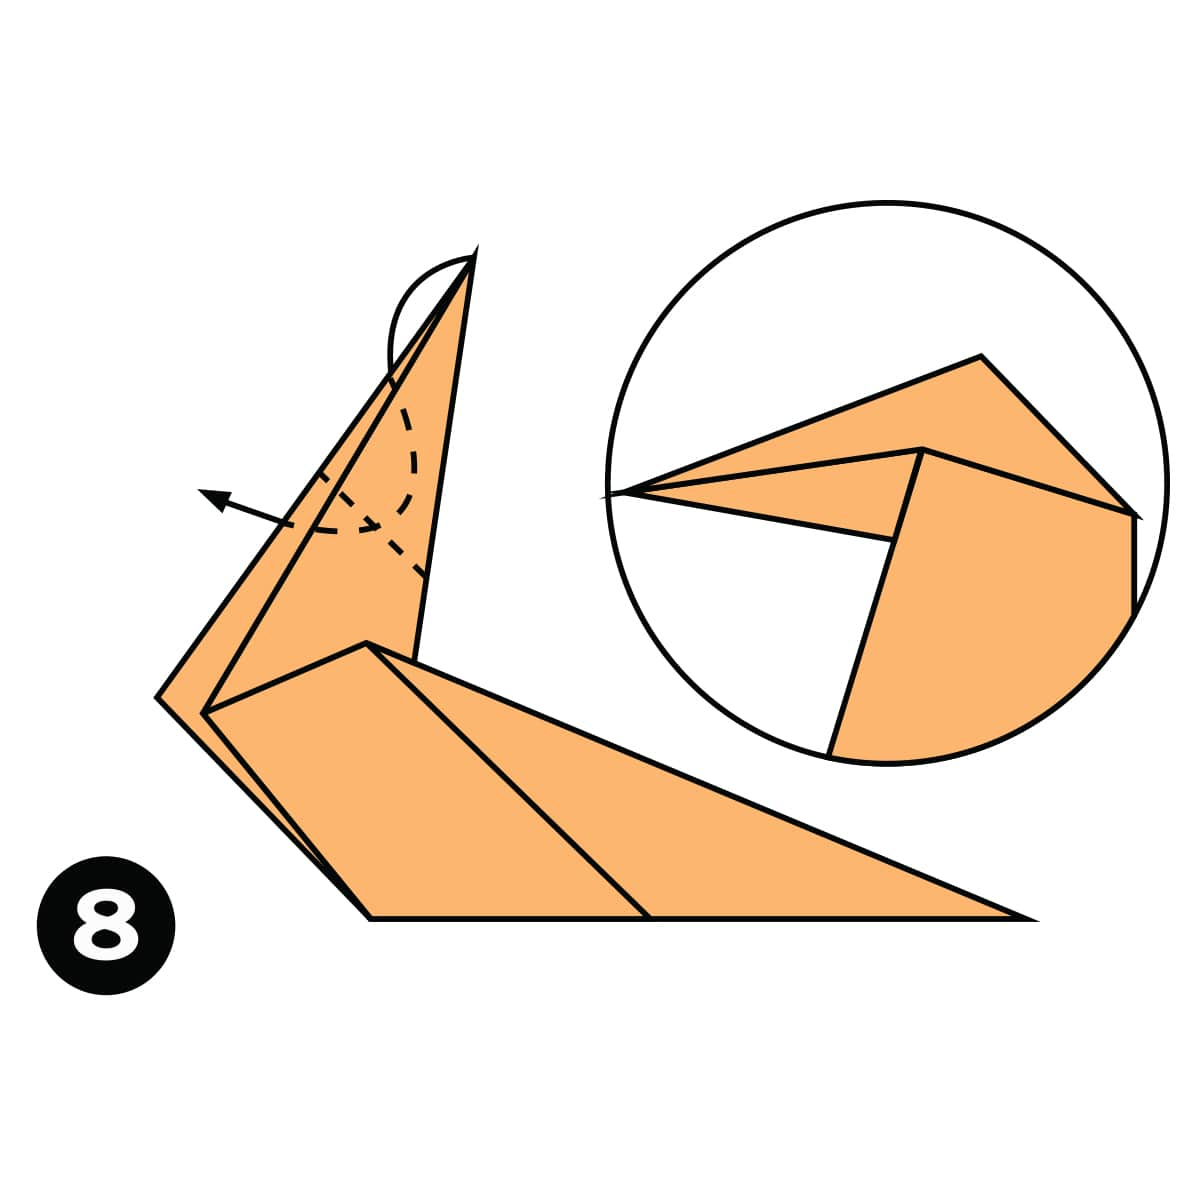 Horse Step 8